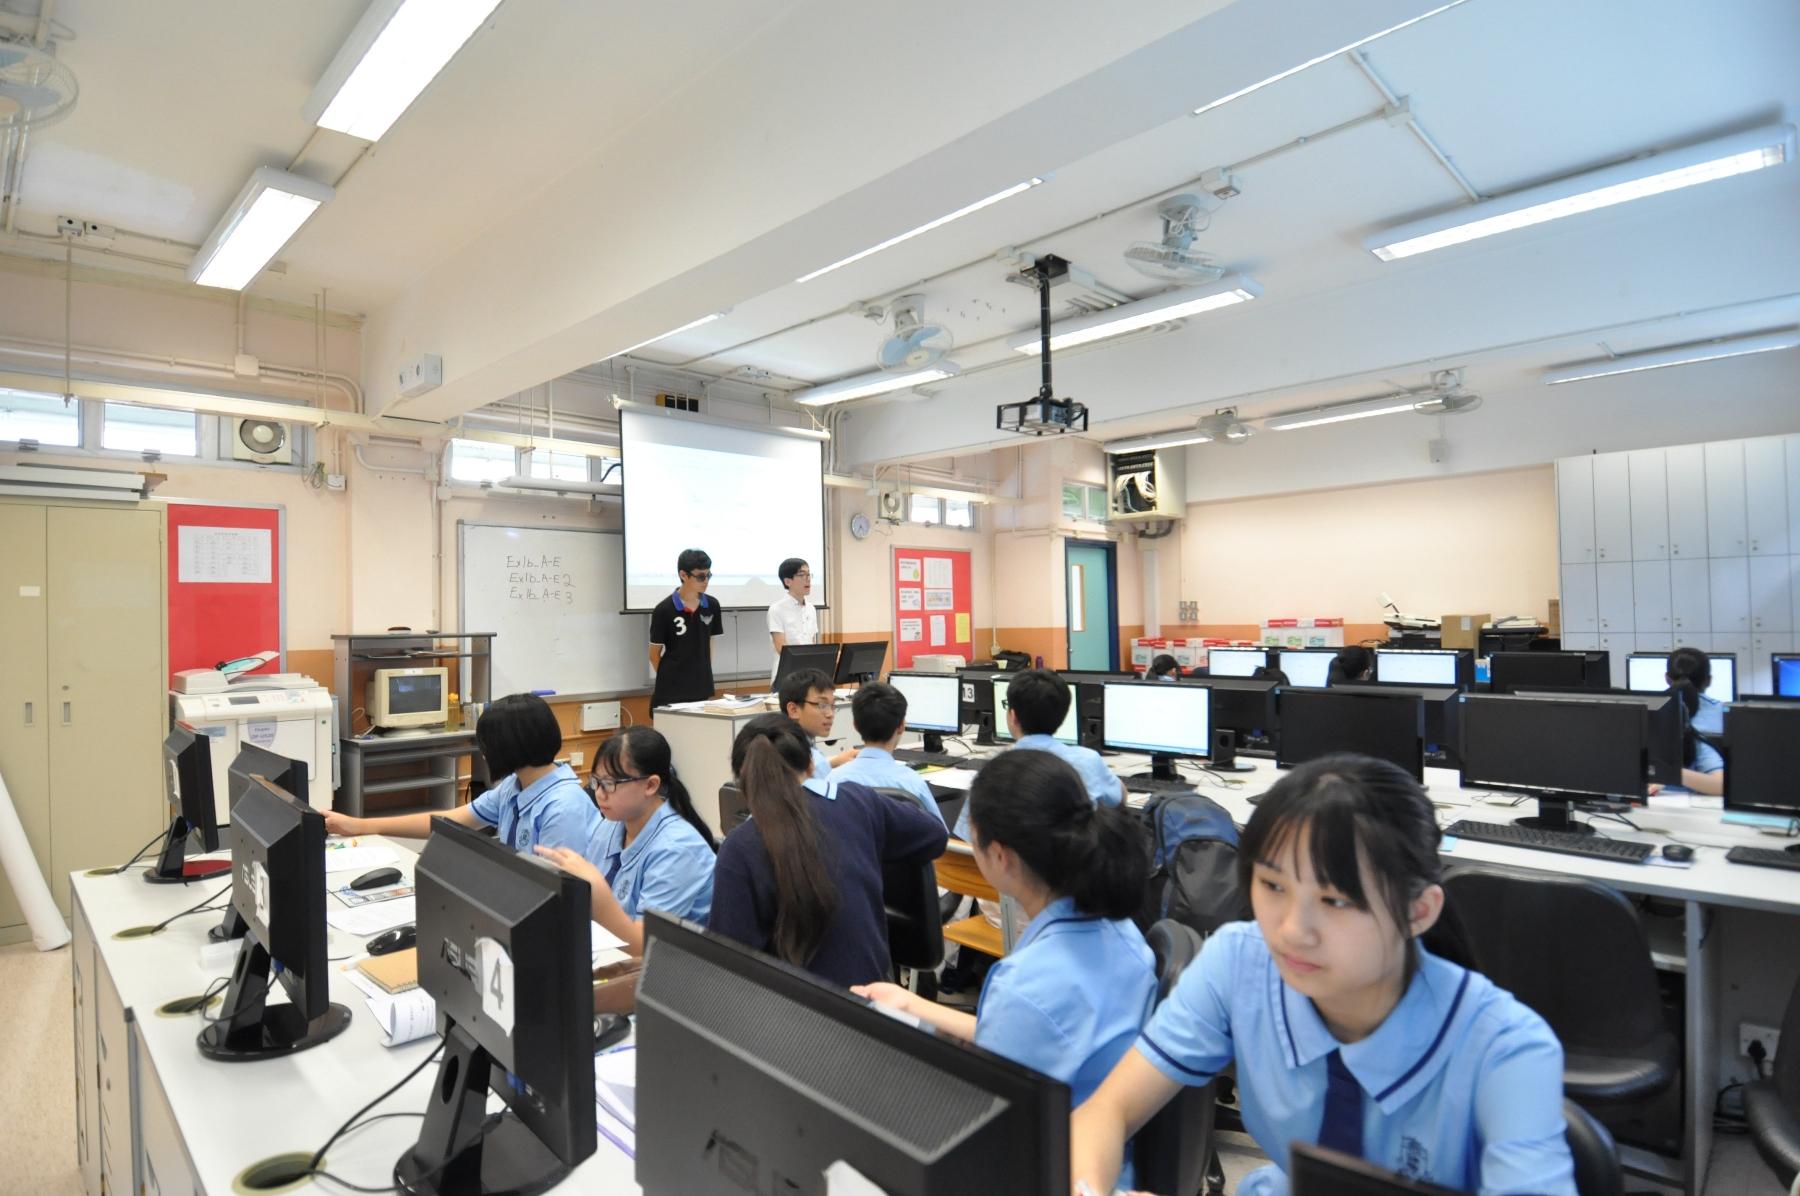 http://www.npc.edu.hk/sites/default/files/dsc_0215.jpg